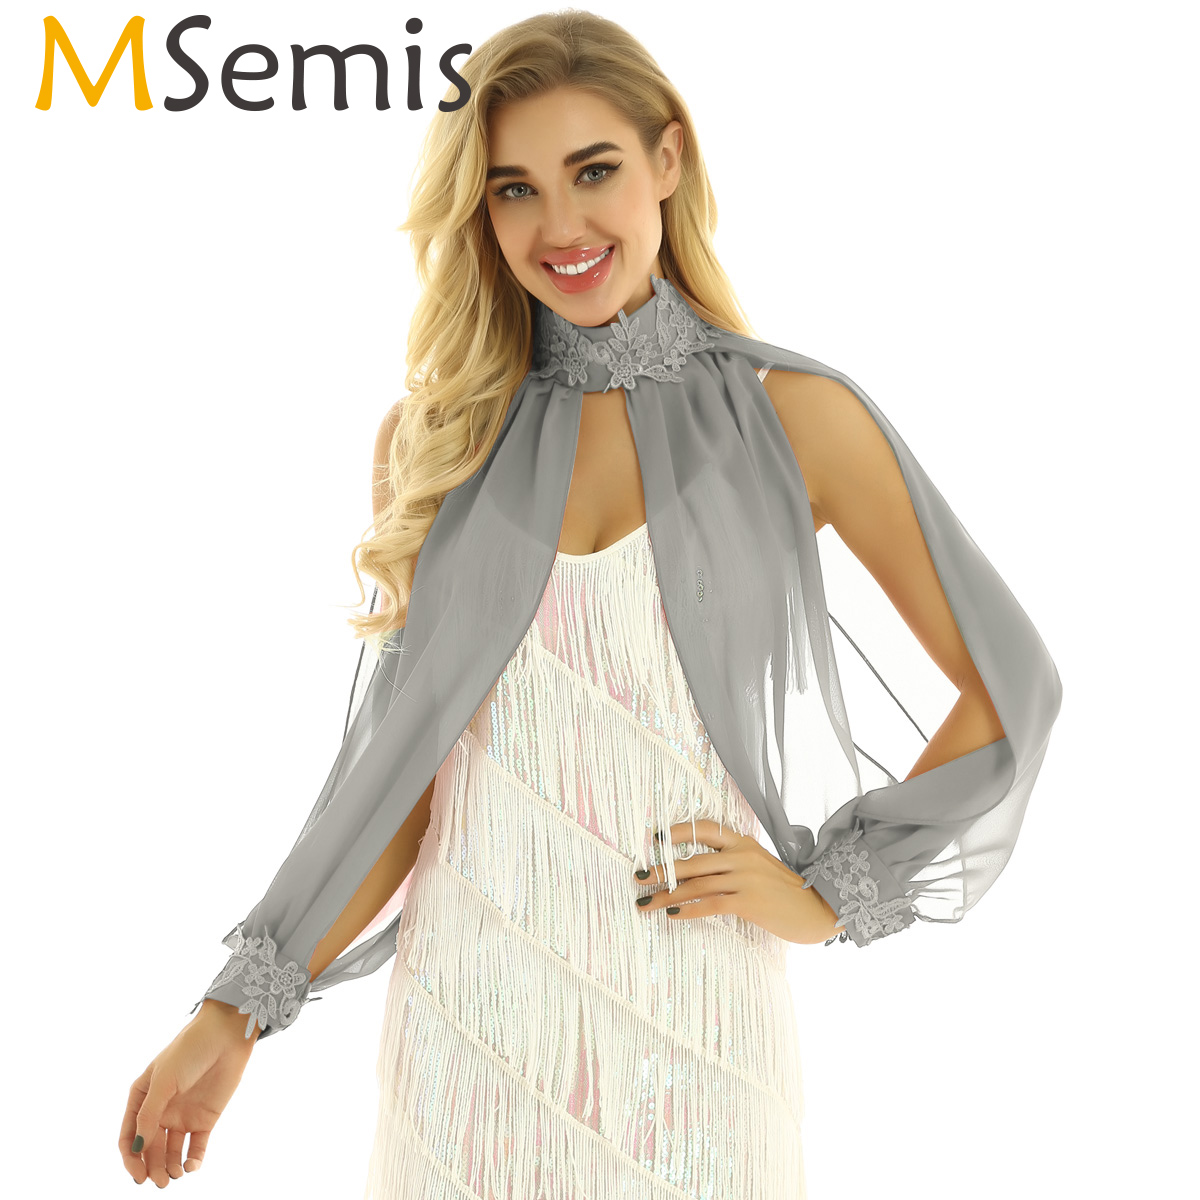 MSemis Women Sleeves With Split Elegant Cape Chiffon Shrug Wraps Arm Warmers Shrug Arm Cover Ups Dance Raglan Long Flare Sleeve